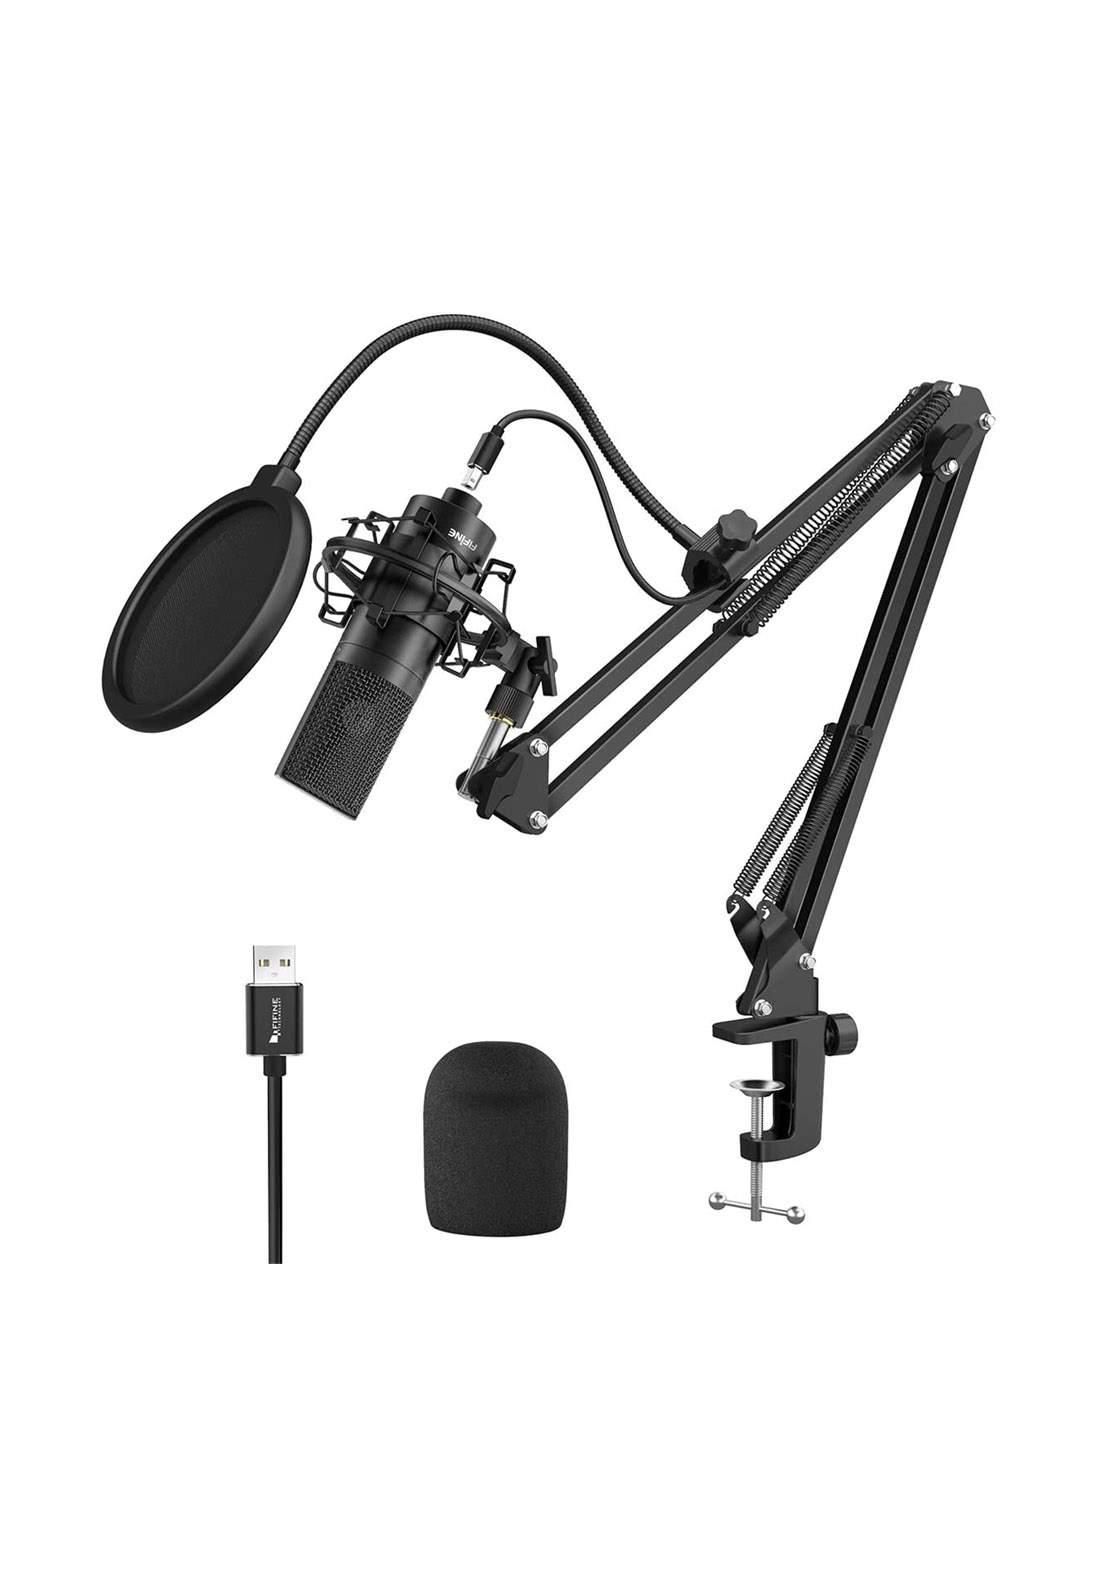 Fifine K780 Recording USB Microphone With Arm Stand - Black مايكرفون